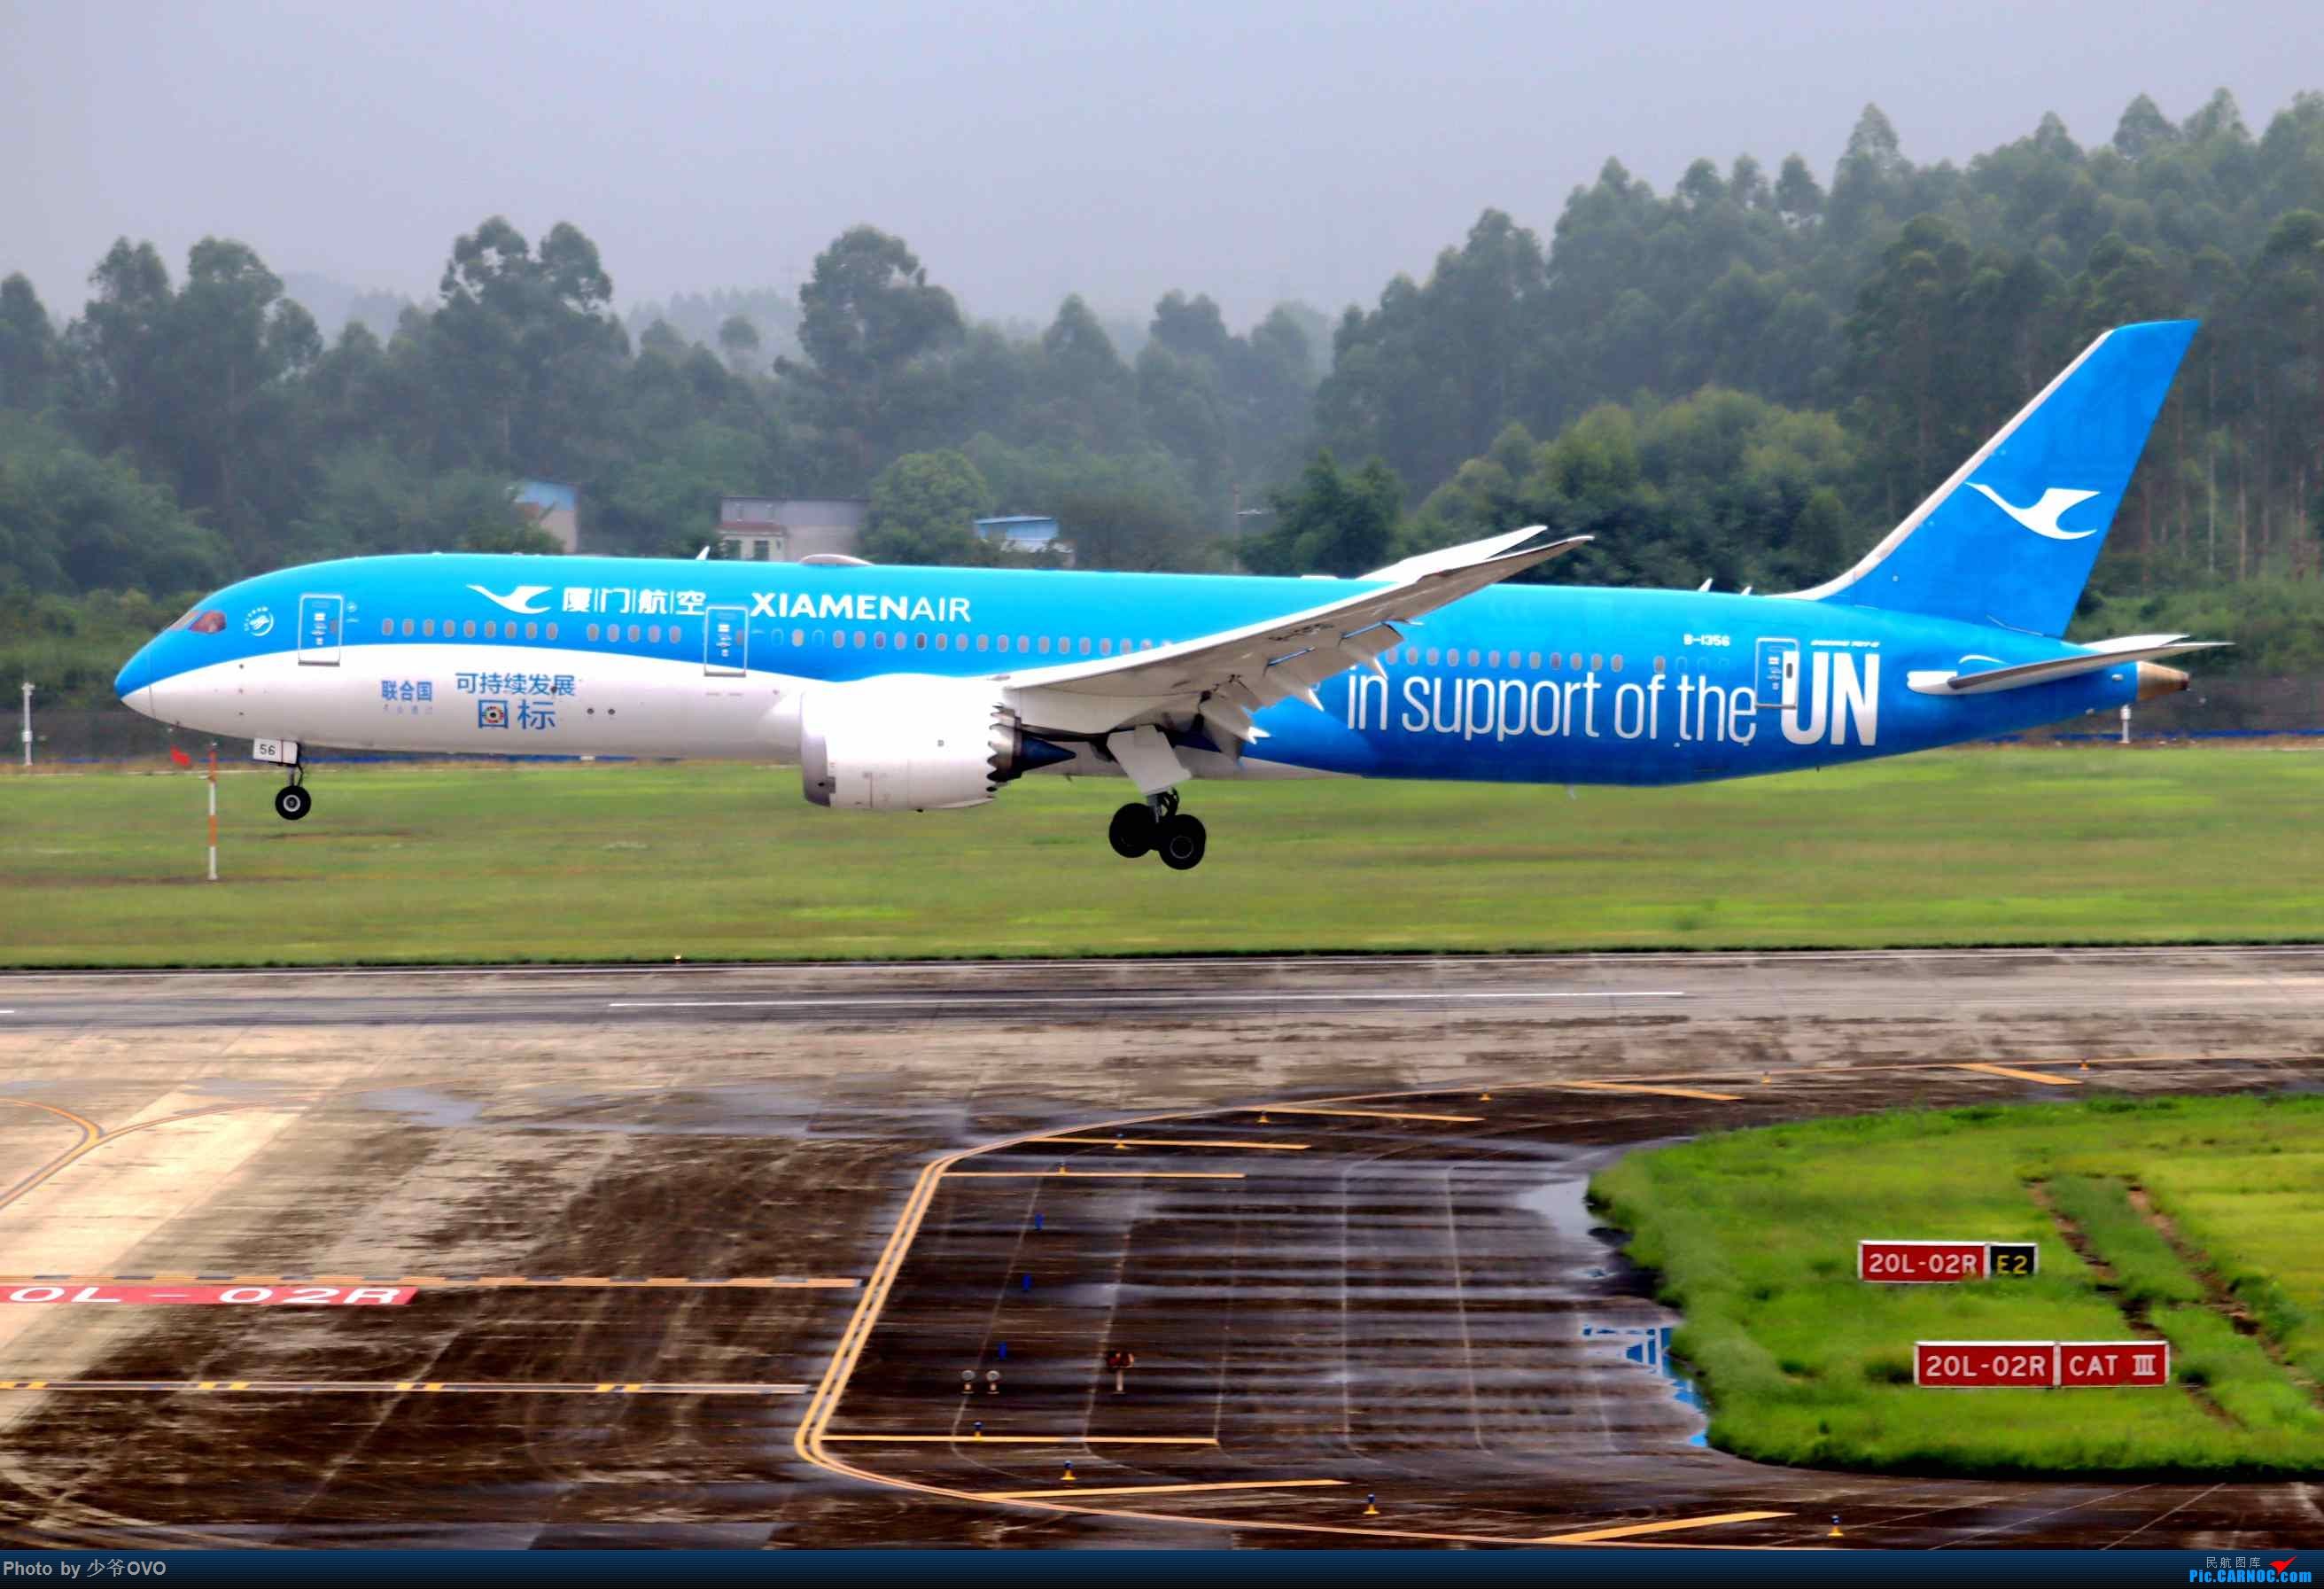 Re:[原创](2020.8.1)少爷的CTU拍机(厦门航空联合国787) BOEING 787-9 B-1356 中国成都双流国际机场